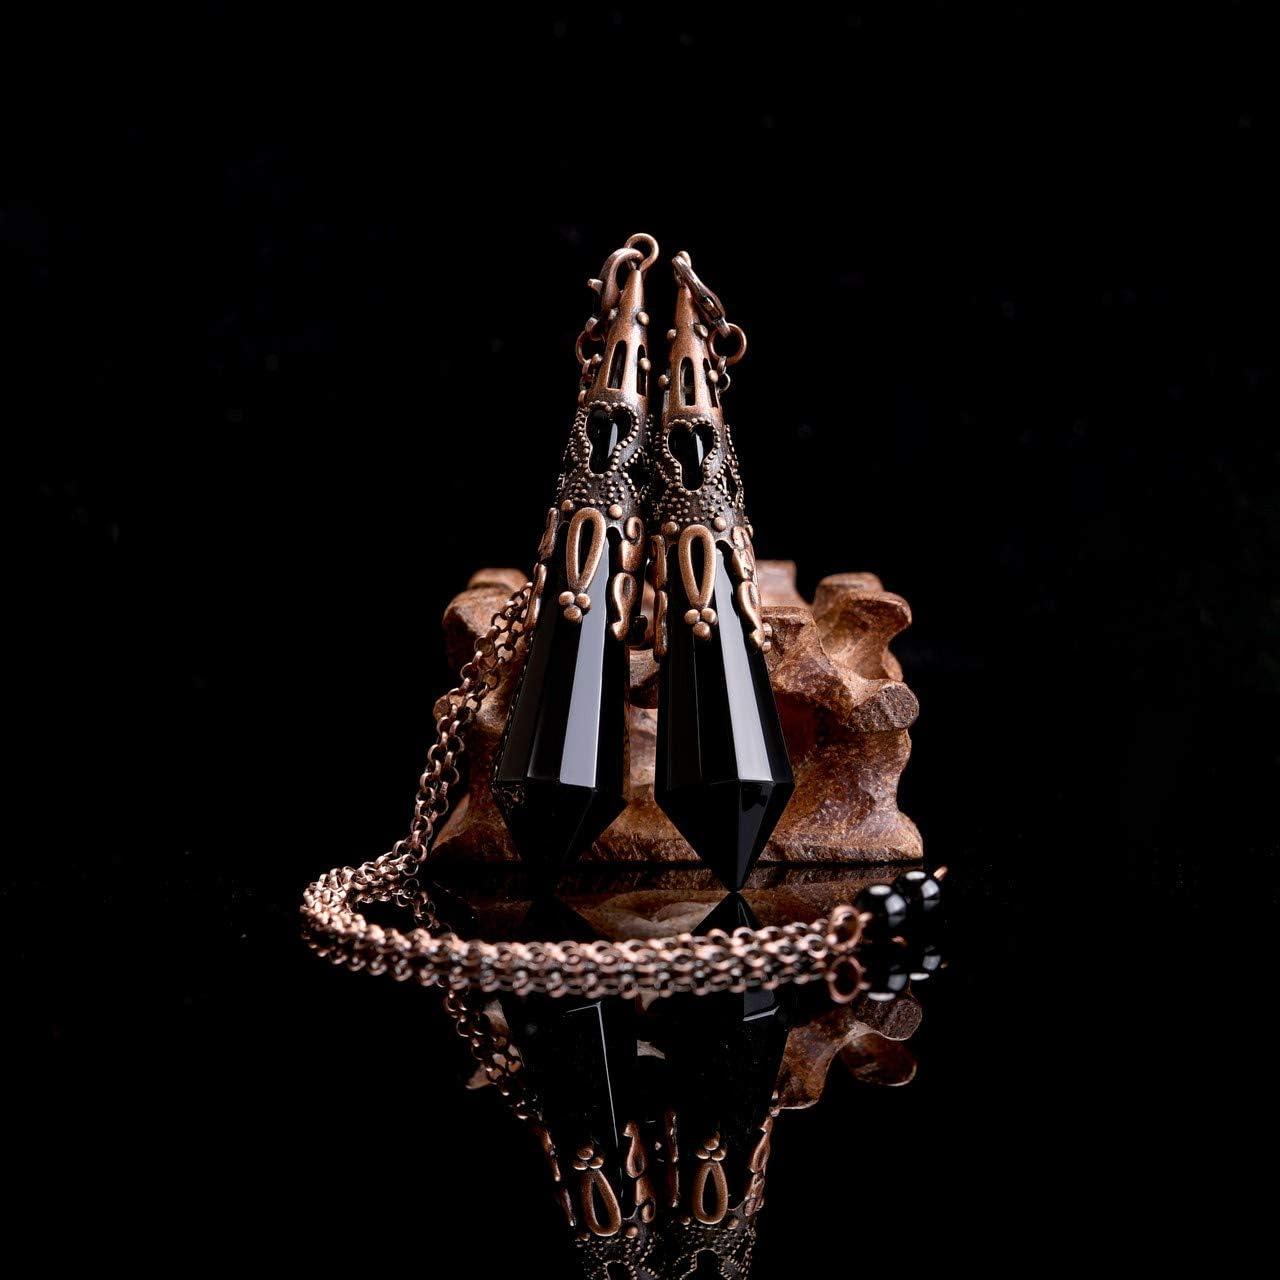 CrystalTears Natural Black Obsidian Healing Crystal Pendulum Antique 12 Facet Chakra Crystal Point Pendant Pendulum for Dowsing Divination Reiki Healing Meditation